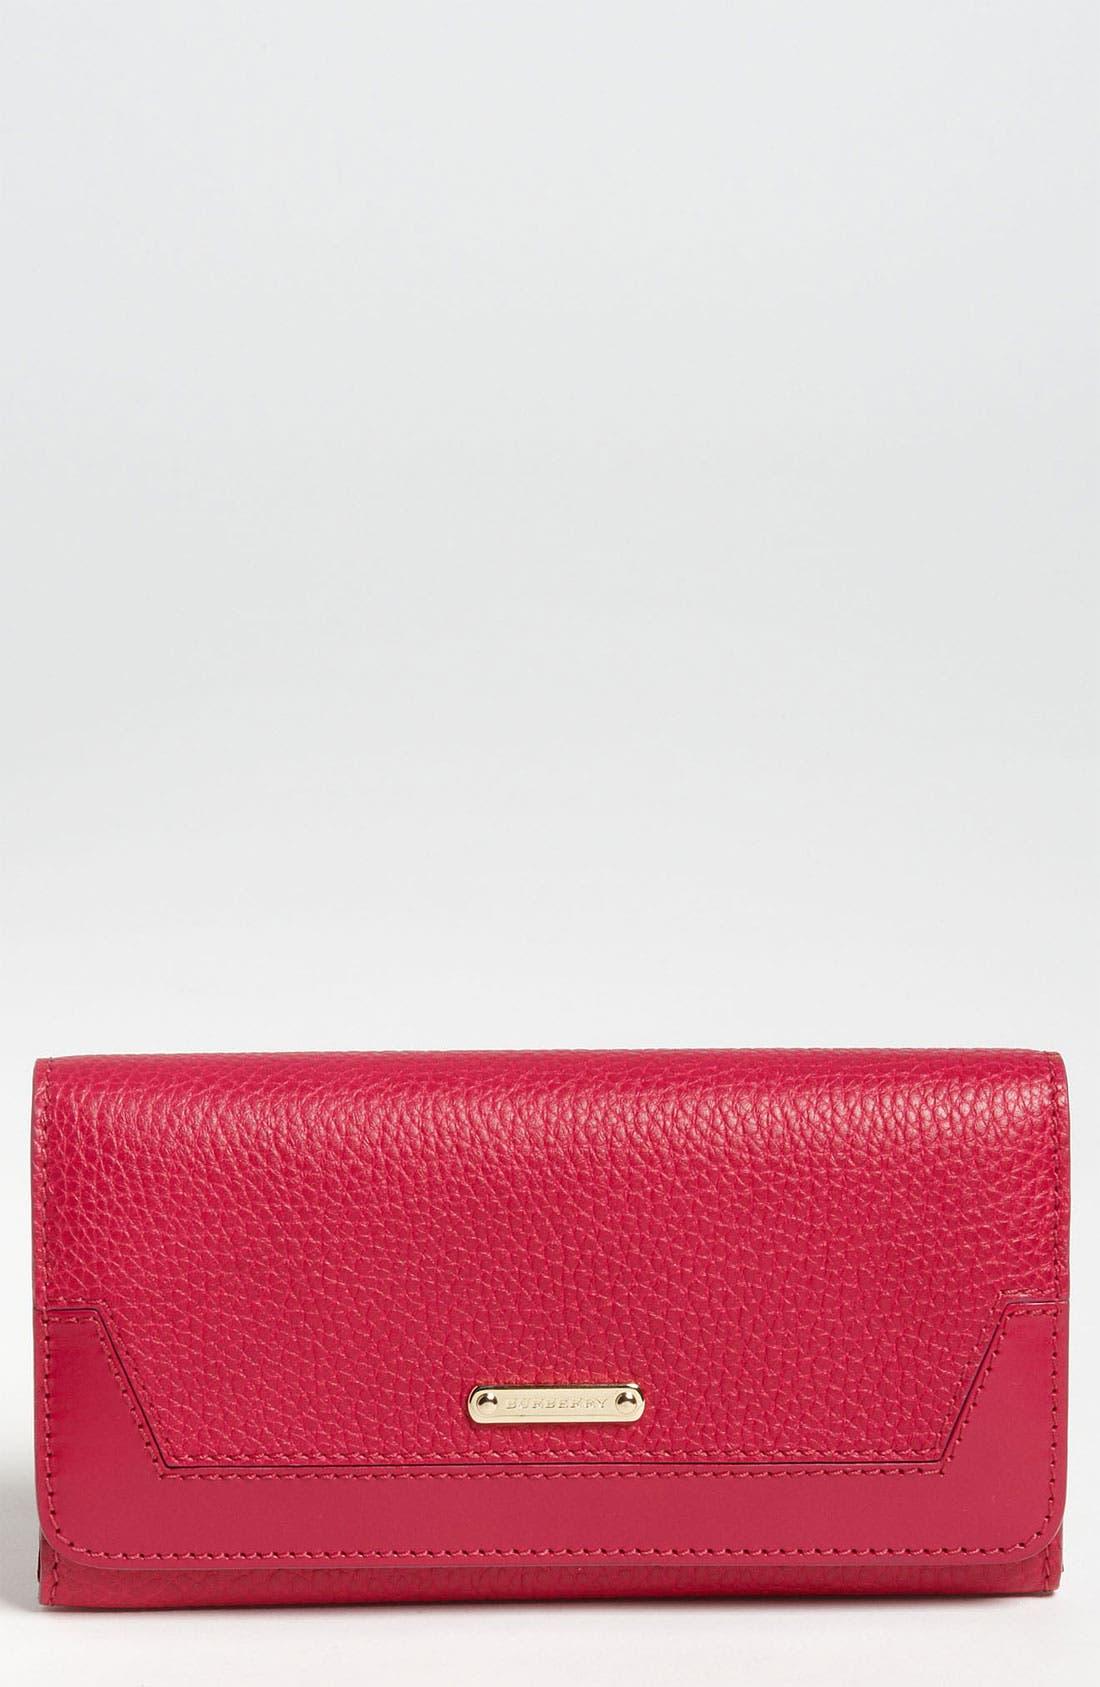 Alternate Image 1 Selected - Burberry 'London Grainy' Flap Wallet